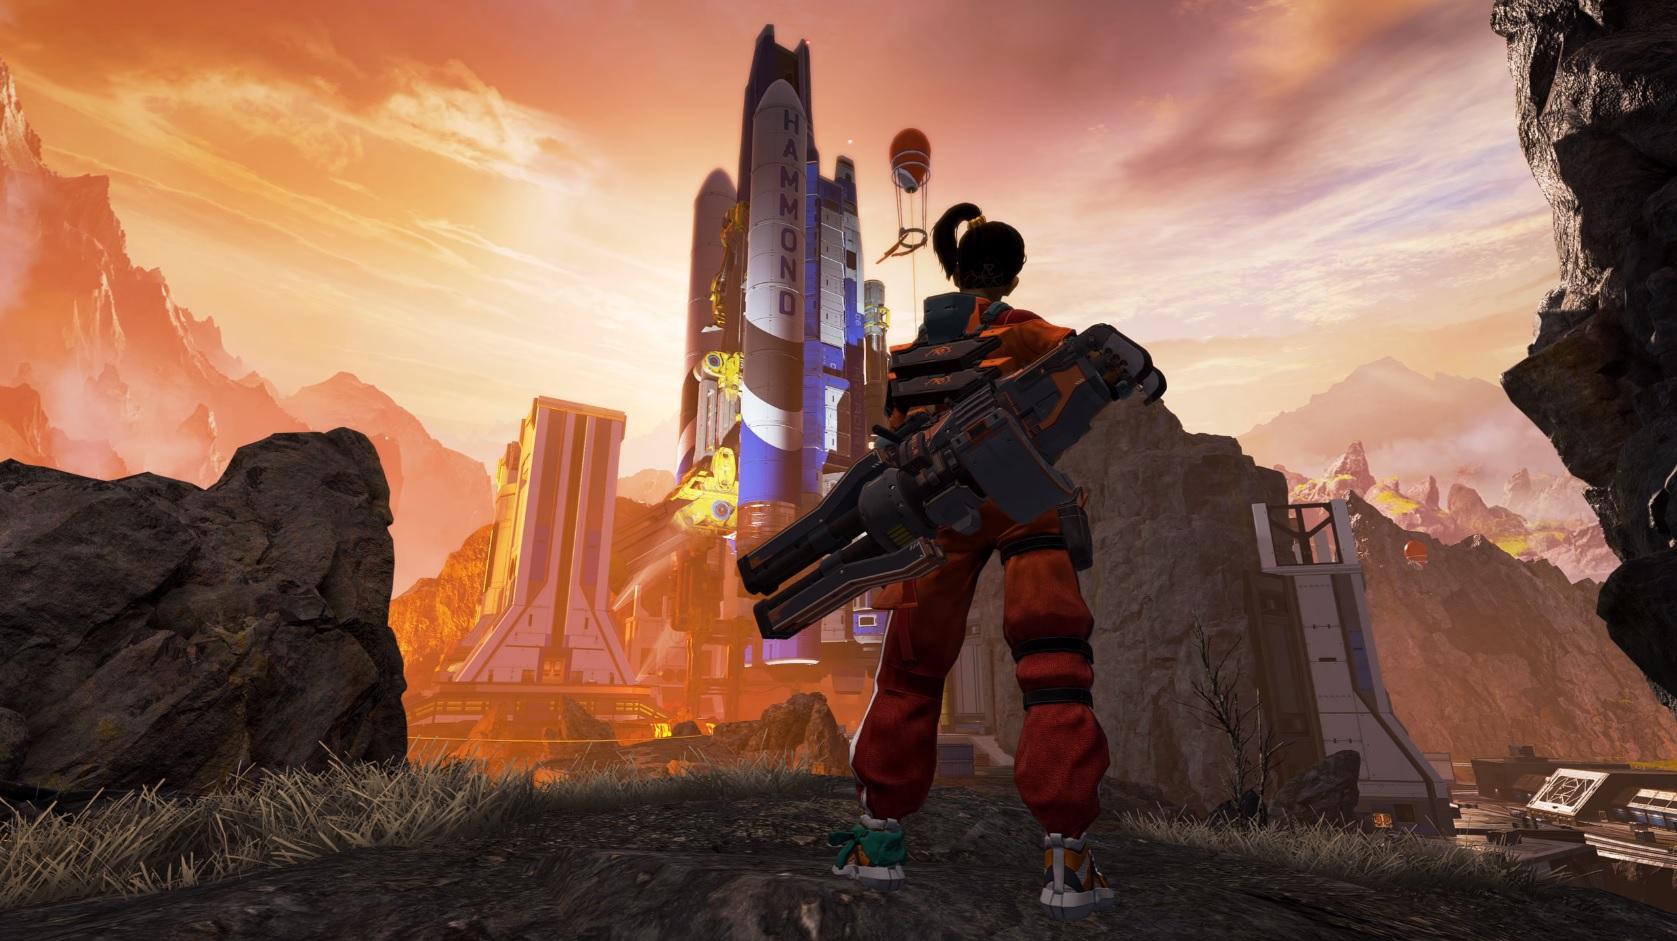 Apex Legends Season 6 gameplay trailer shows a revamped World's Edge map screenshot